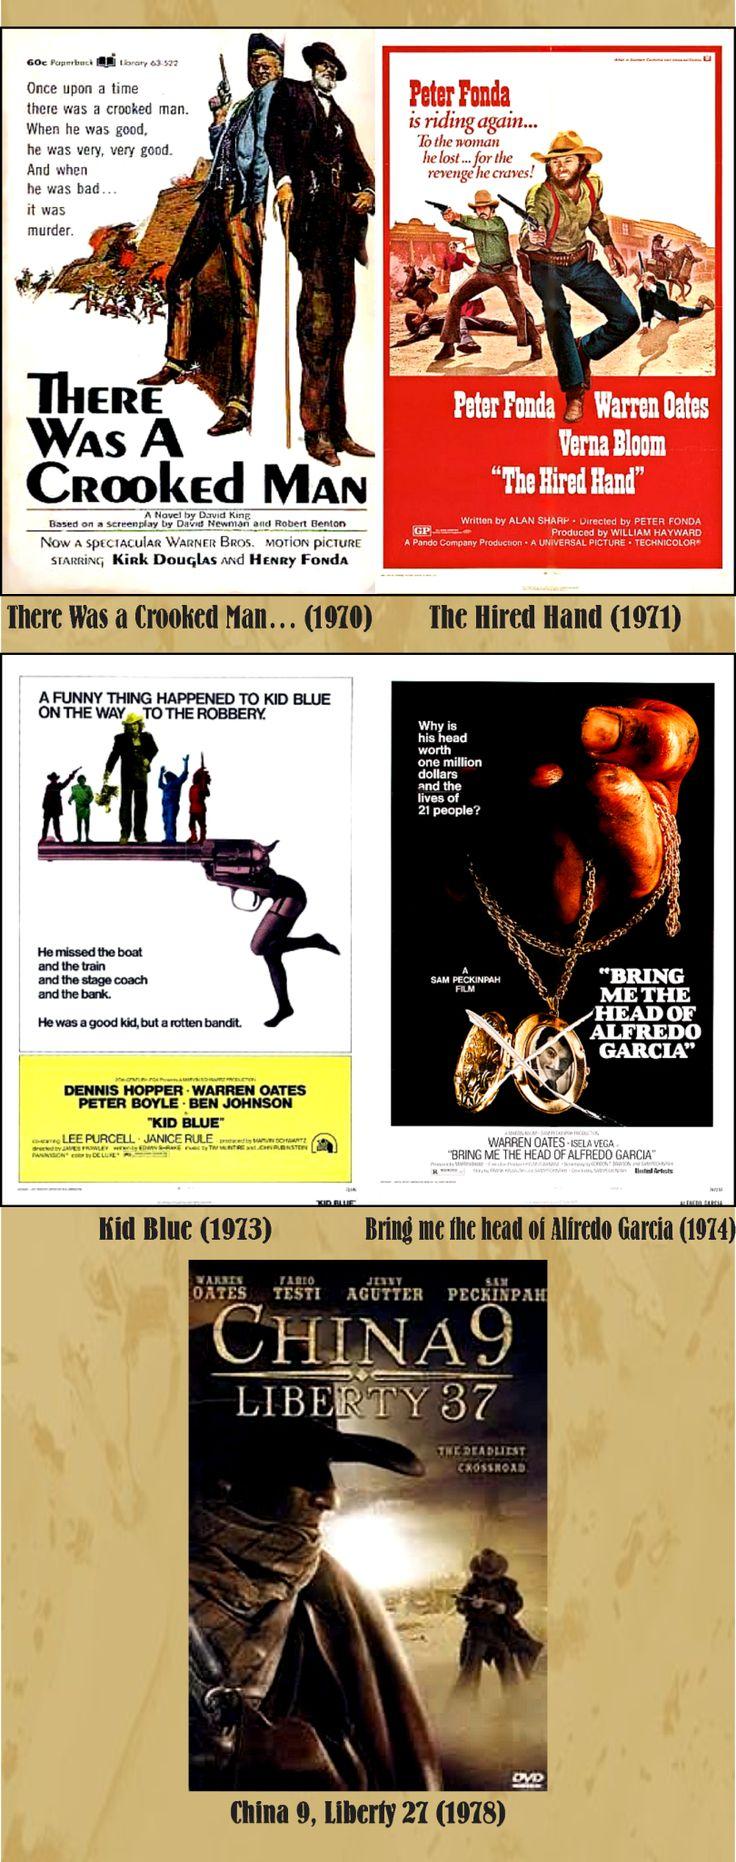 The Wild Bunch - The Cast - Warren Oates 3